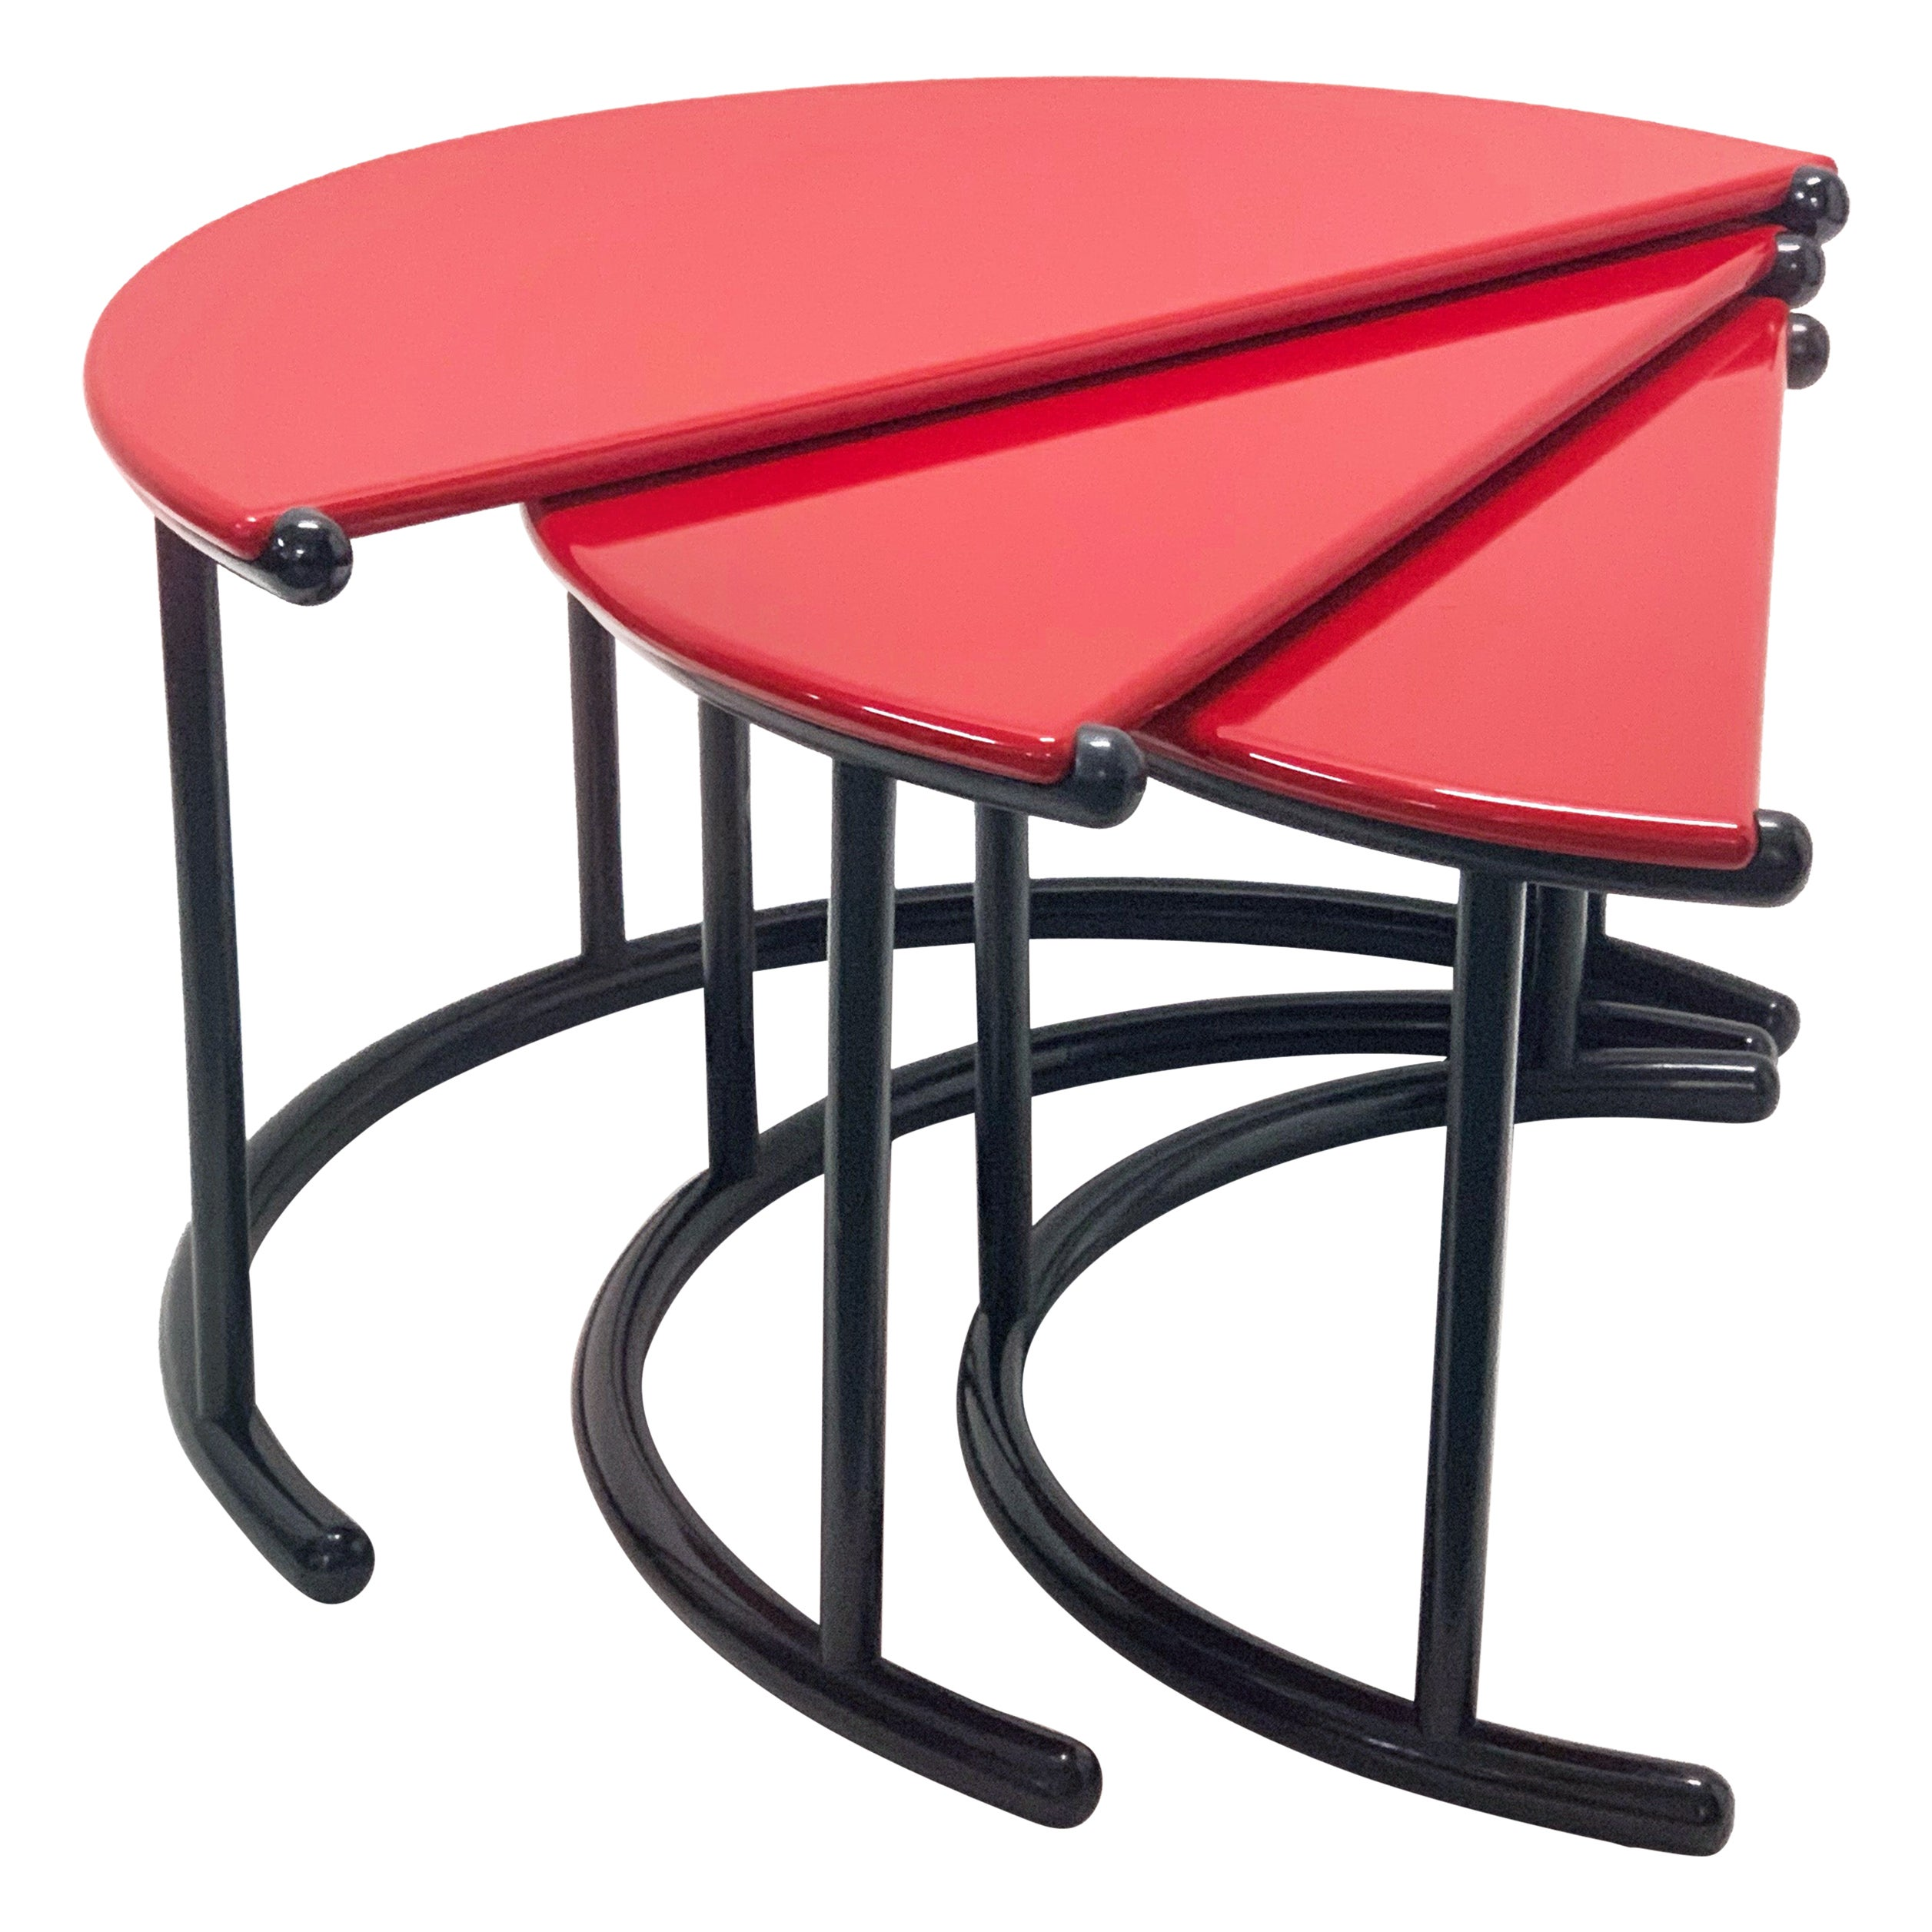 Gianfranco Frattini 'Tria' Red Italian Nesting Tables for Morphos Acerbis, 1980s